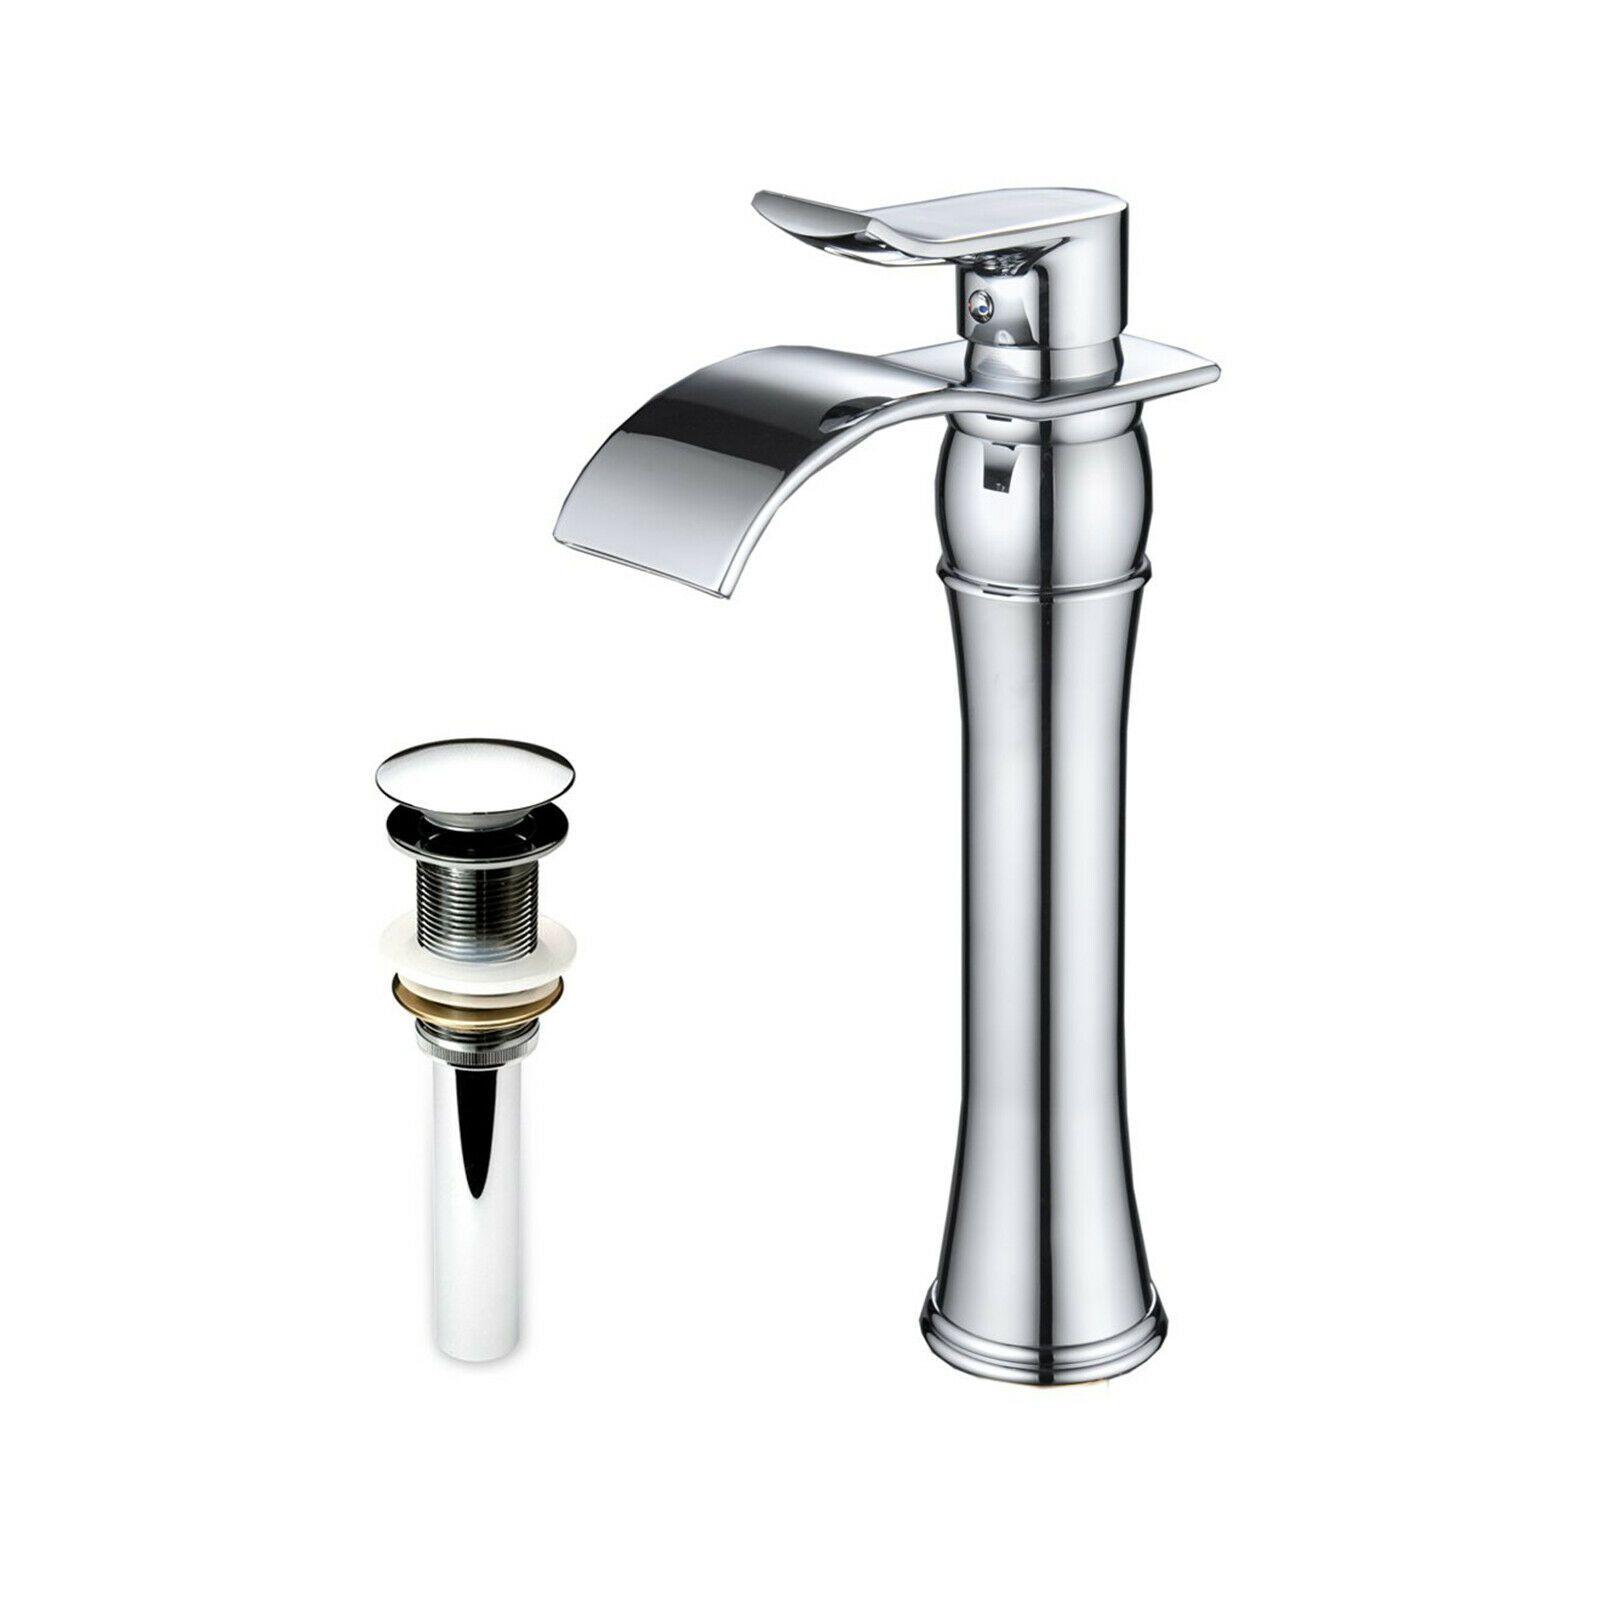 Commercial Waterfall Bathroom Sink Vessel Faucet Single Handle